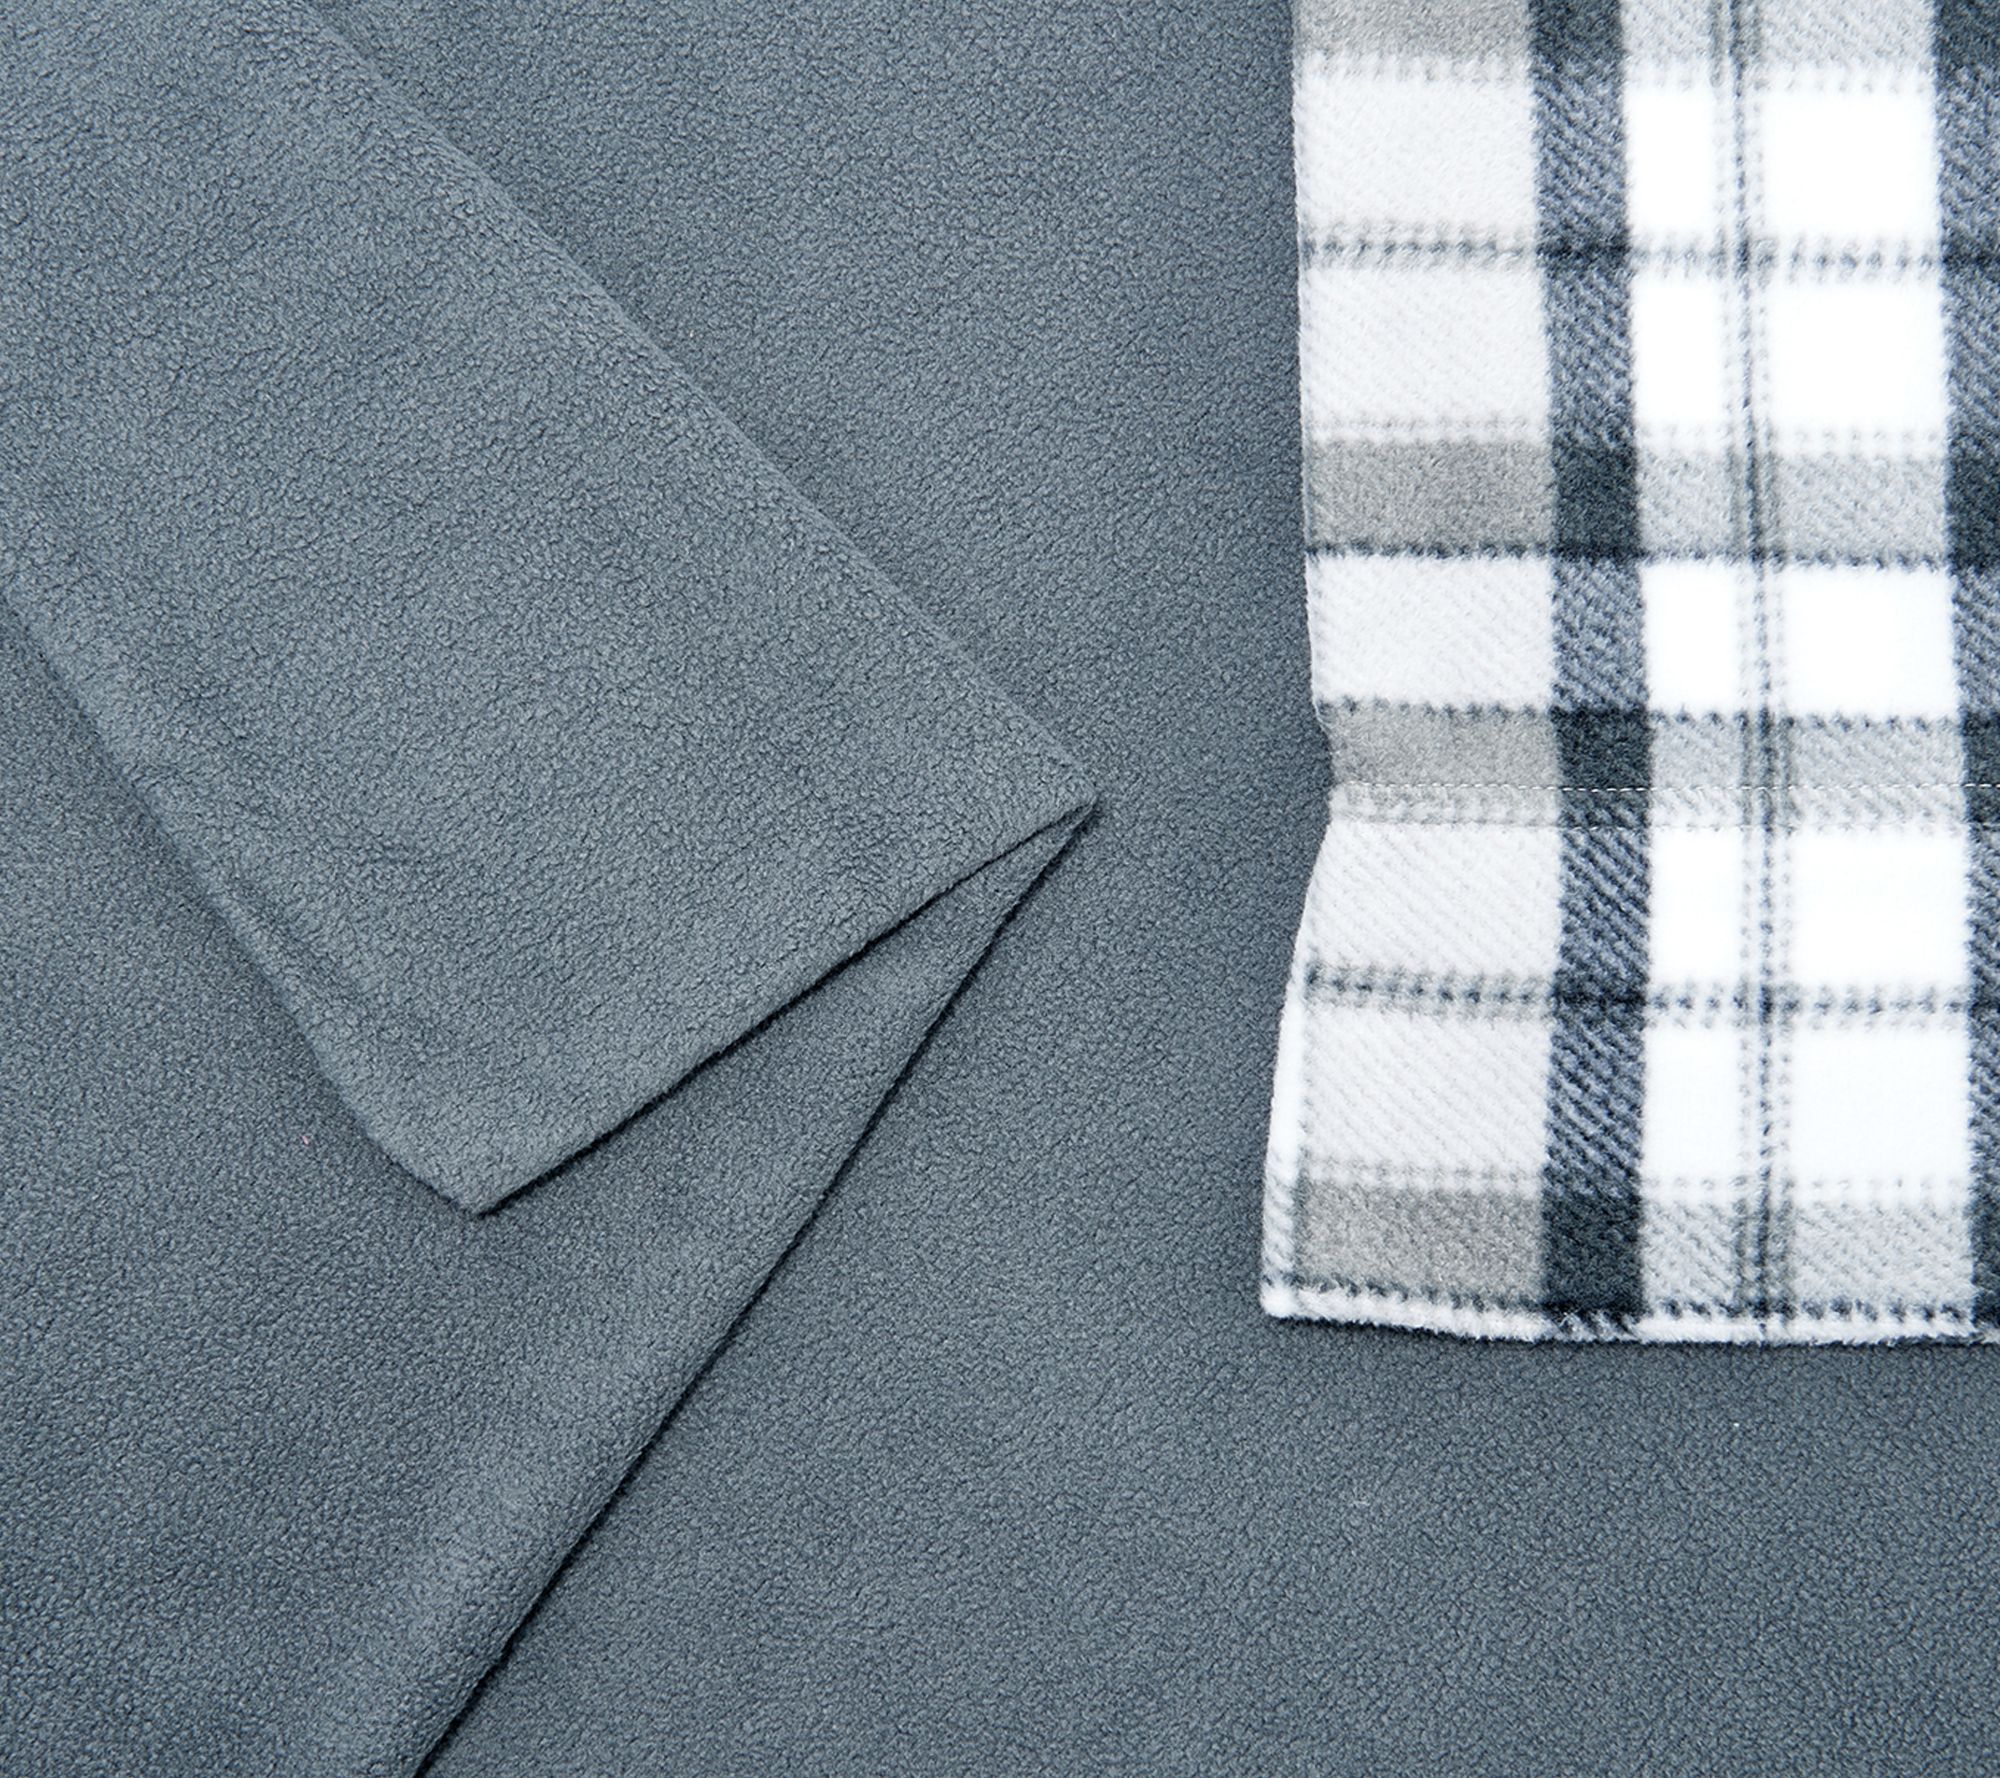 18% discount on a fleece sheet set for colder nights